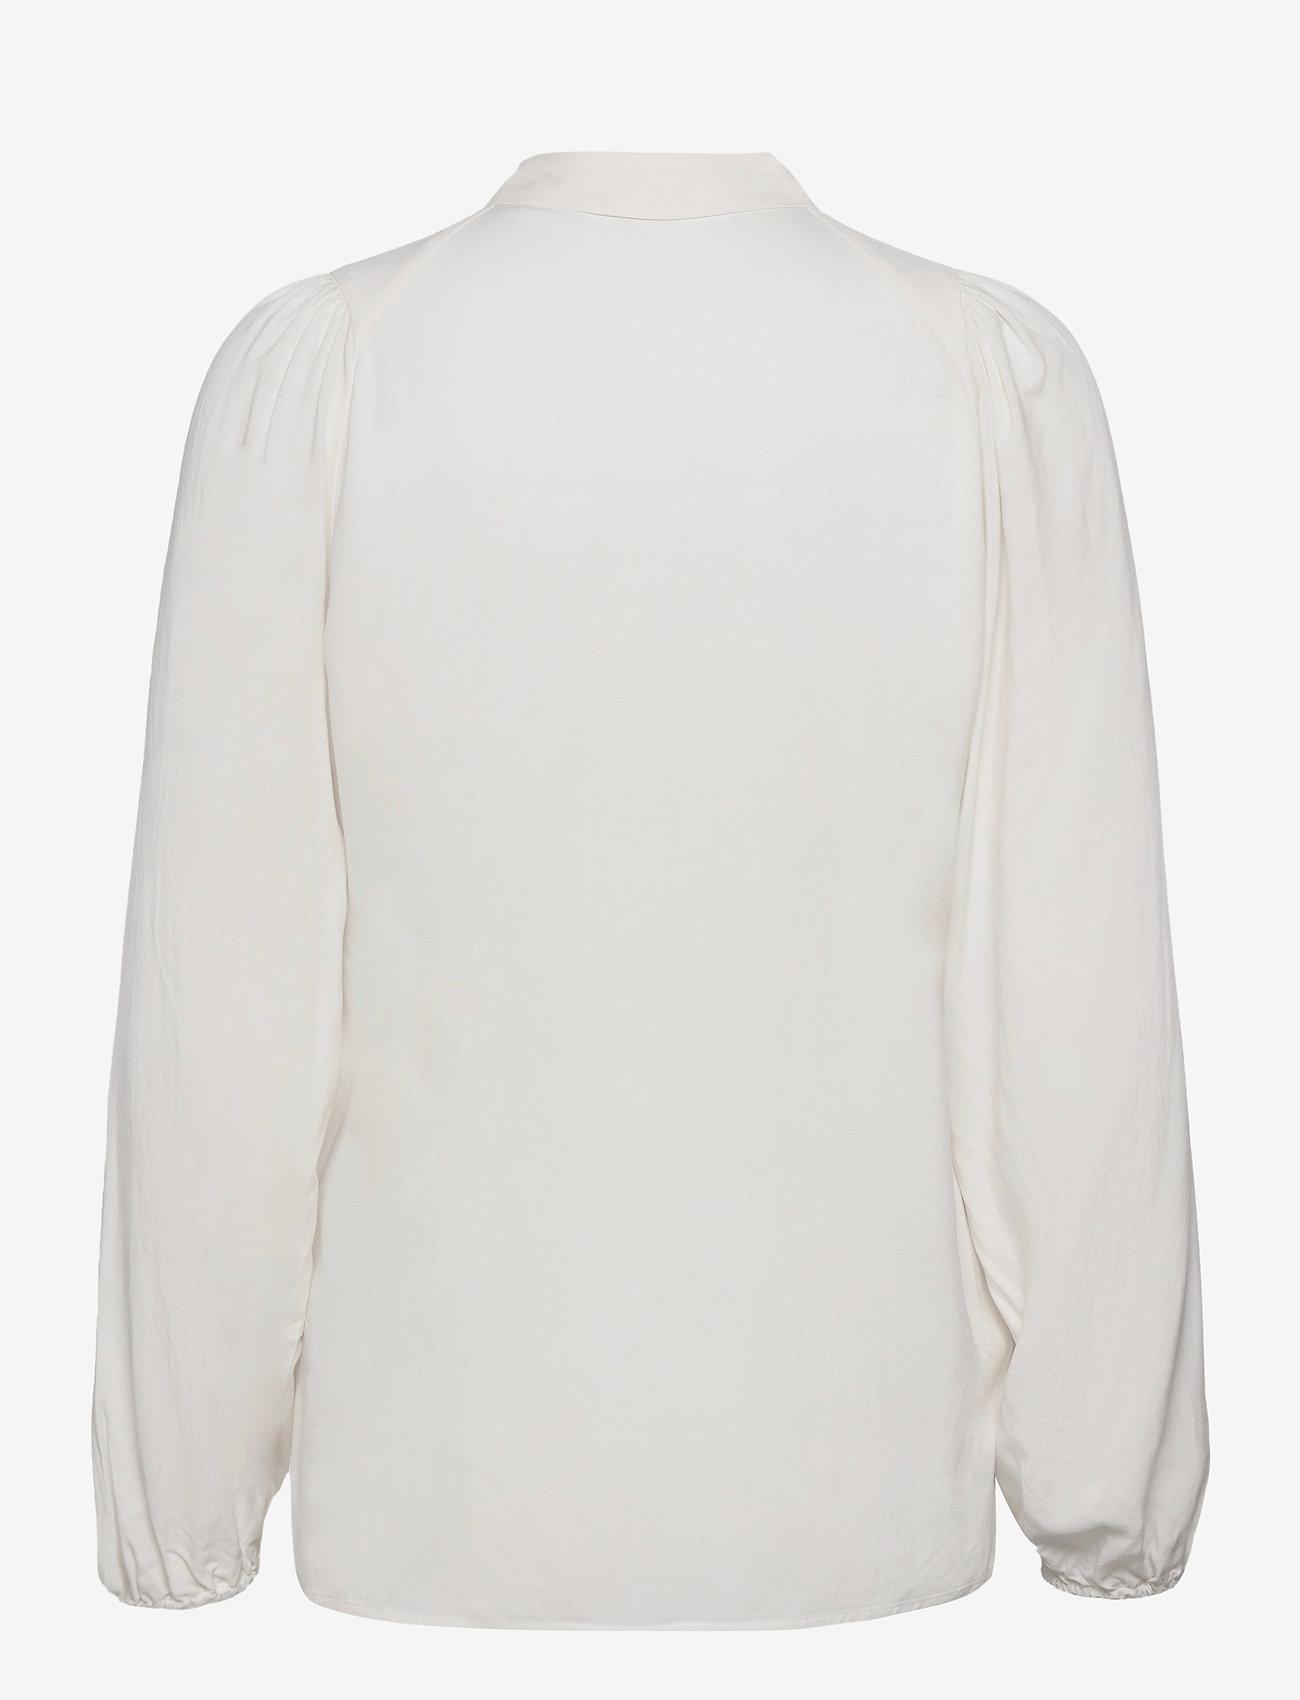 Soyaconcept - SC-RADIA - long sleeved blouses - offwhite - 1